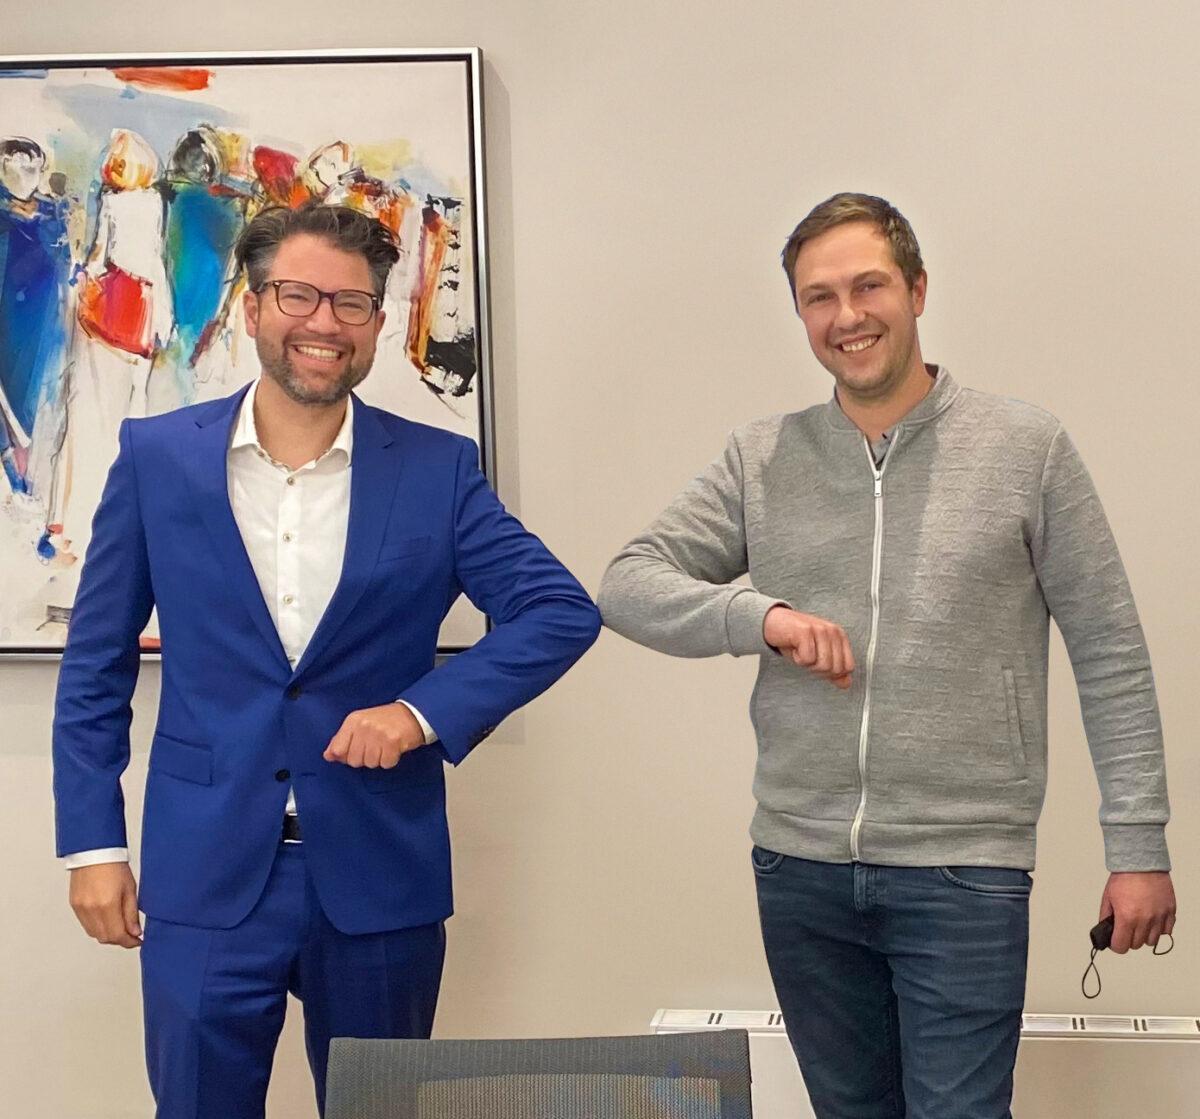 Daniel Sieberer Und Julian Goetzfried Signing Scaled